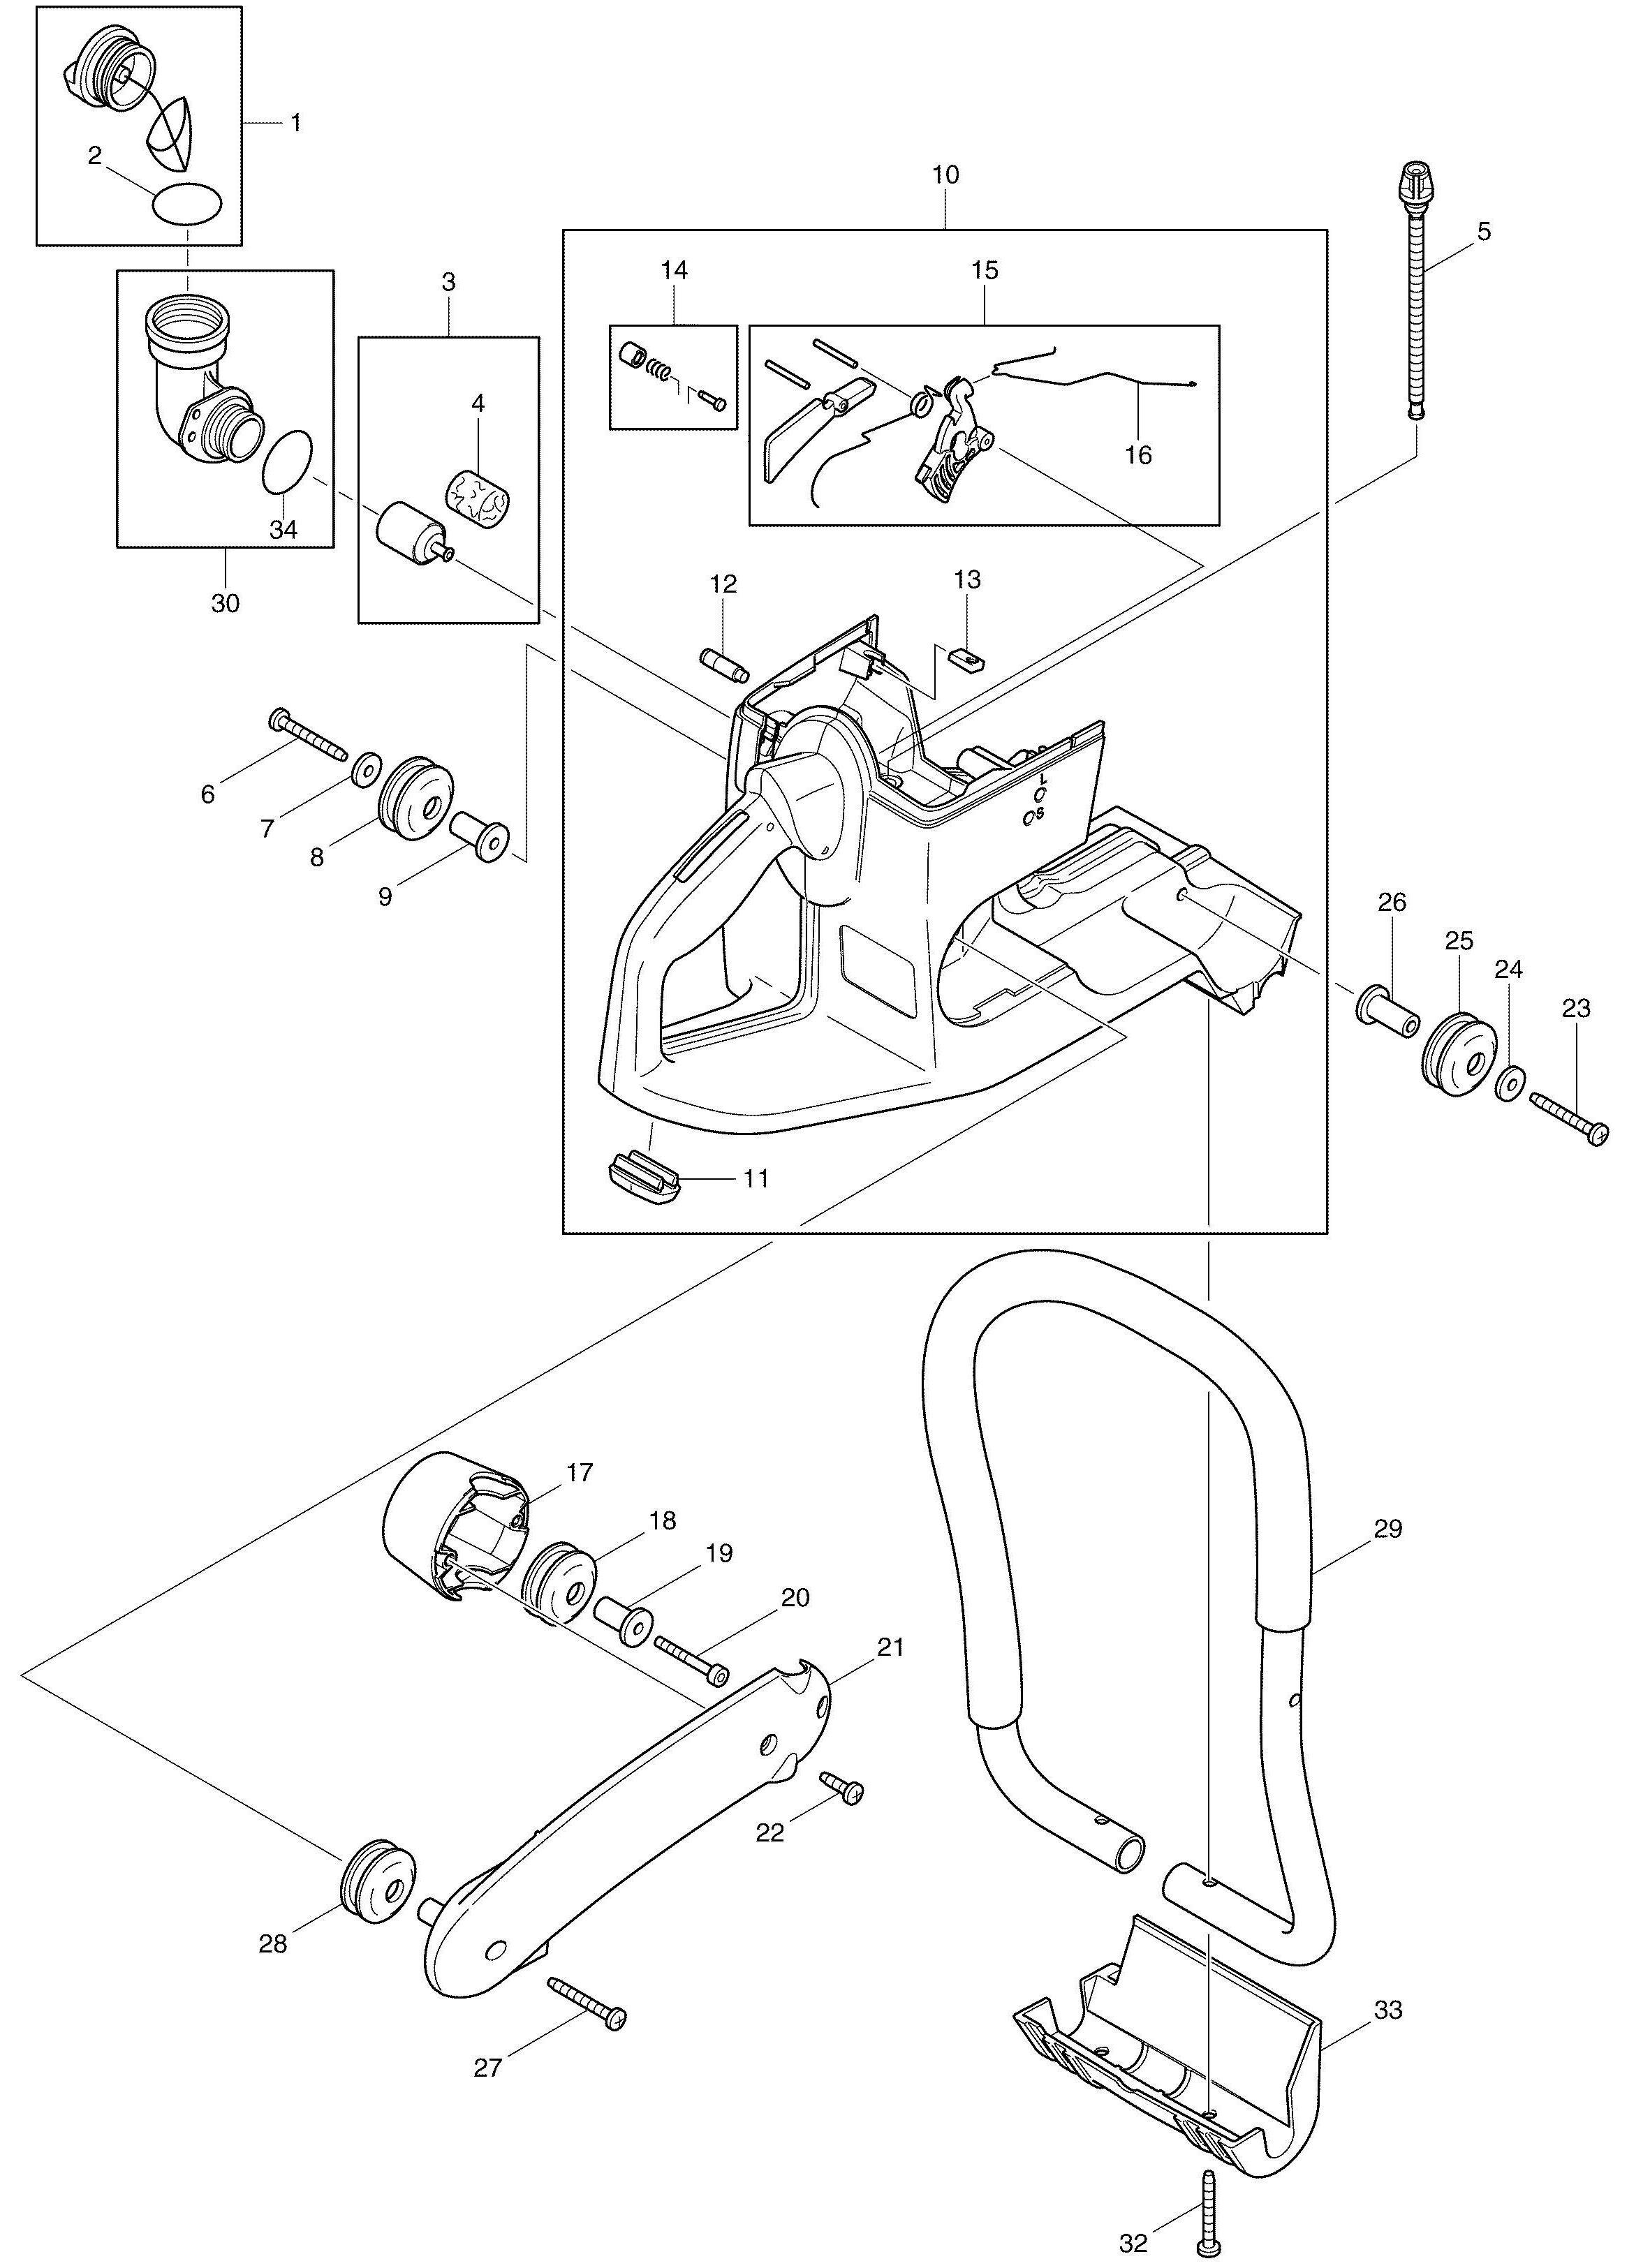 Electric Plug Parts